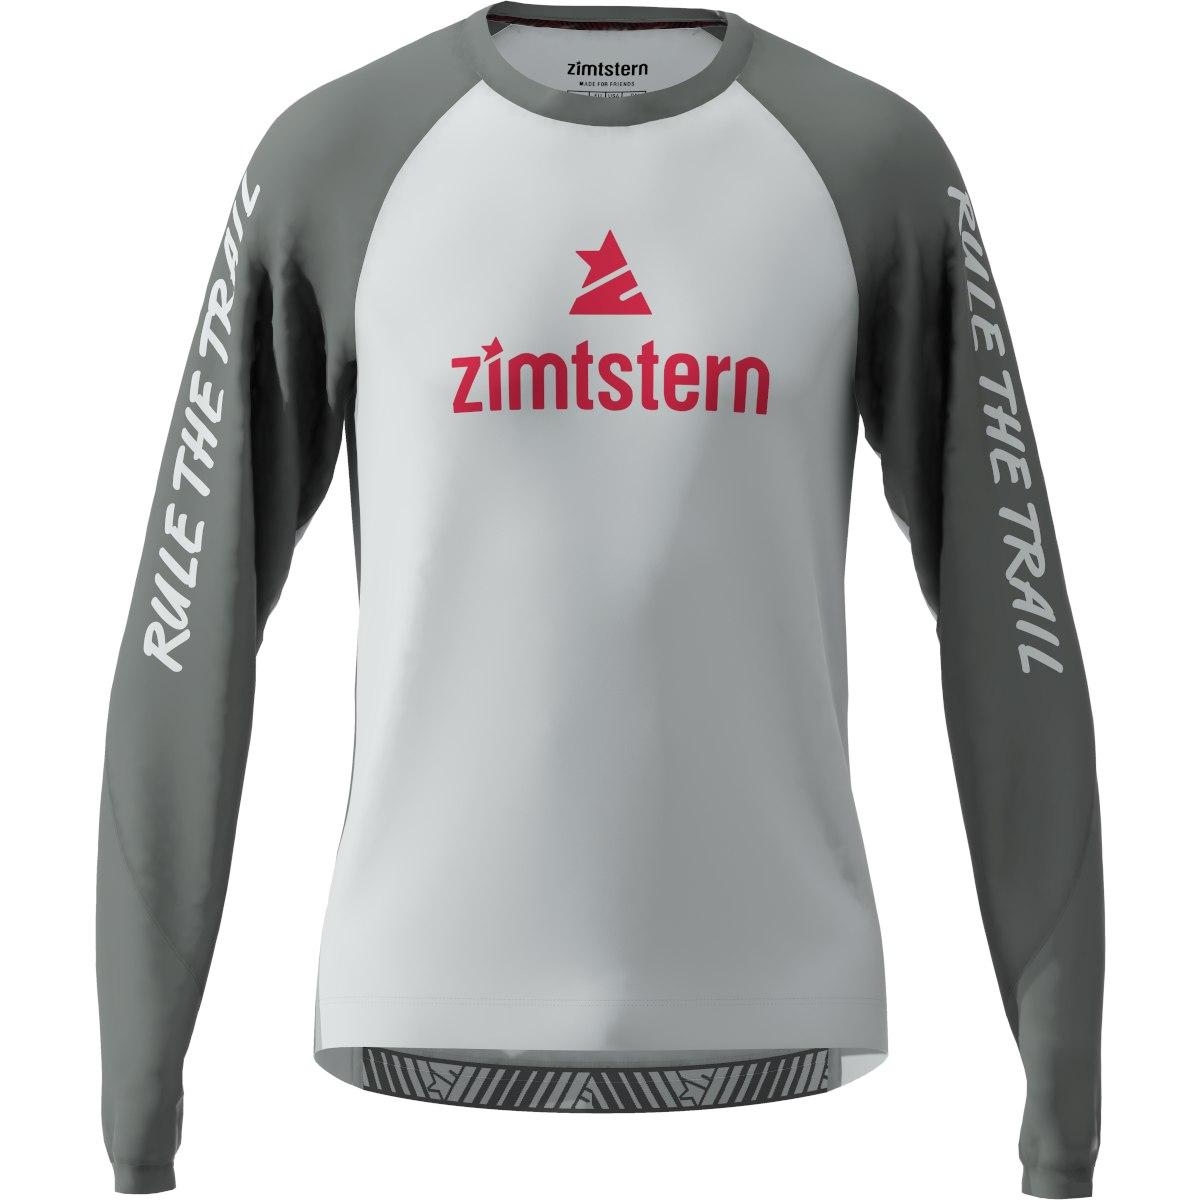 Zimtstern PureFlowz Long Sleeve MTB Shirt - glacier grey/gun metal/jester red